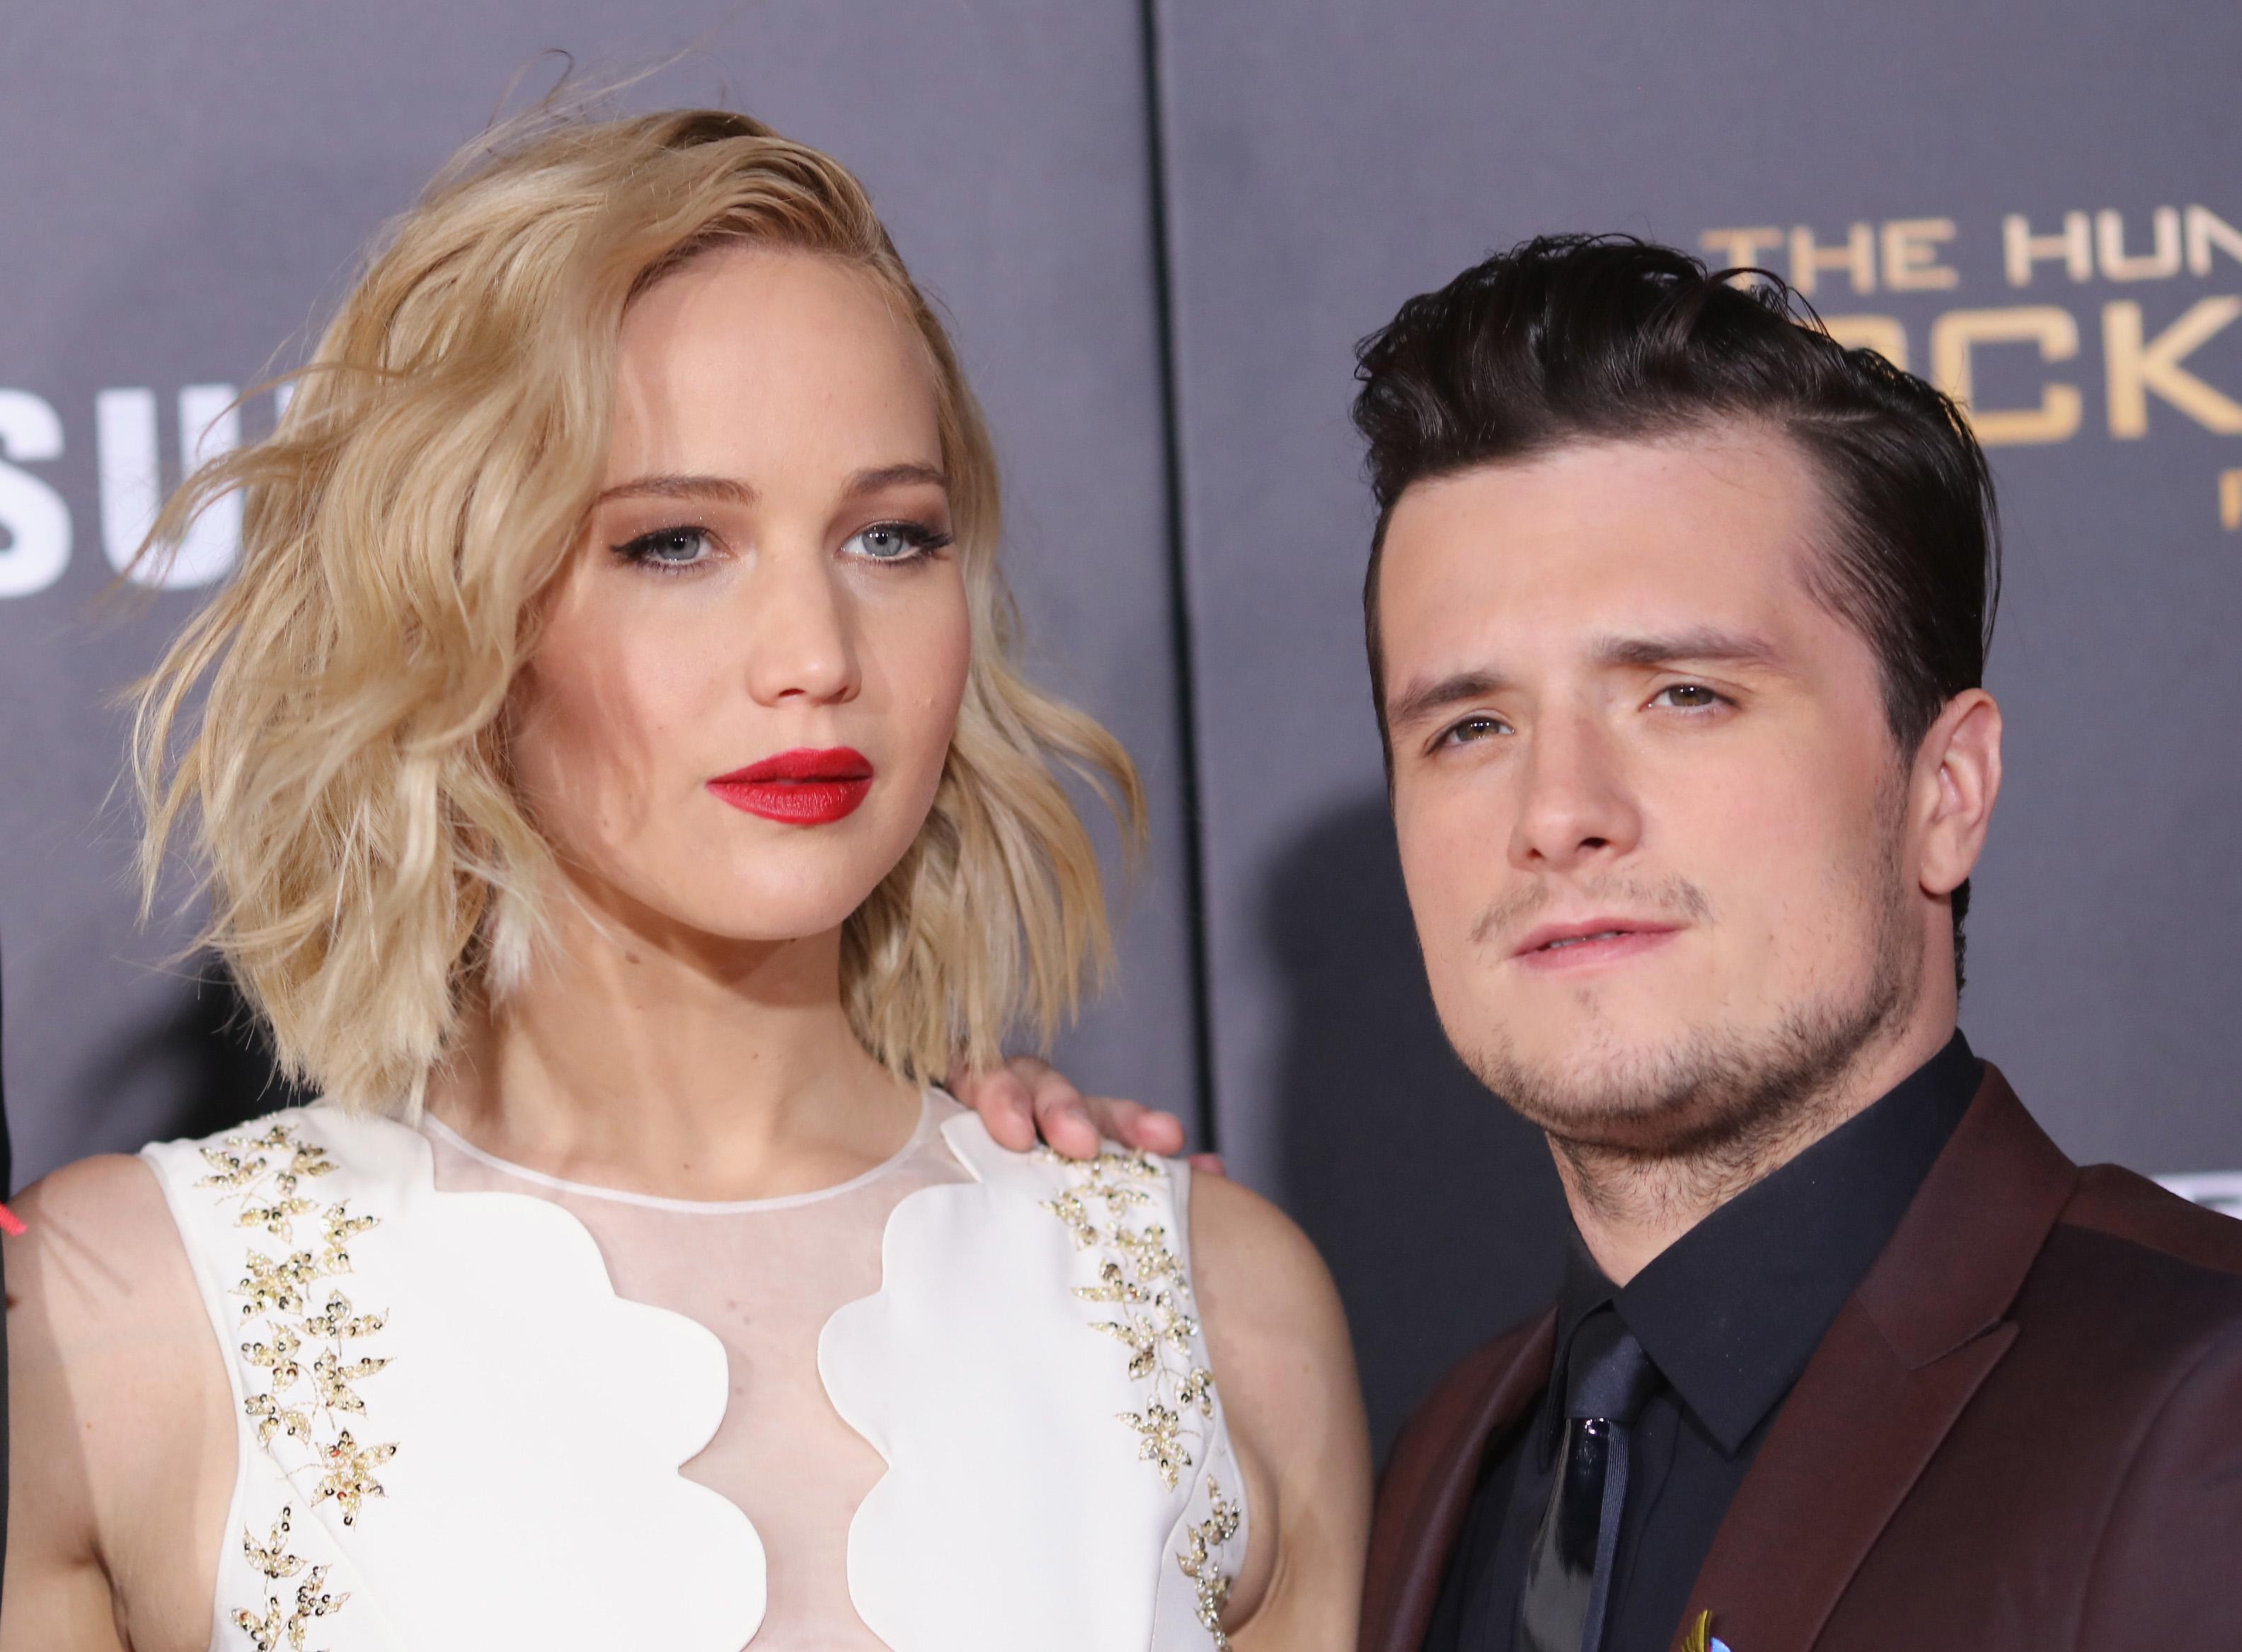 Jennifer Lawrence Picks Josh Hutchersons Beard Hair Proving They